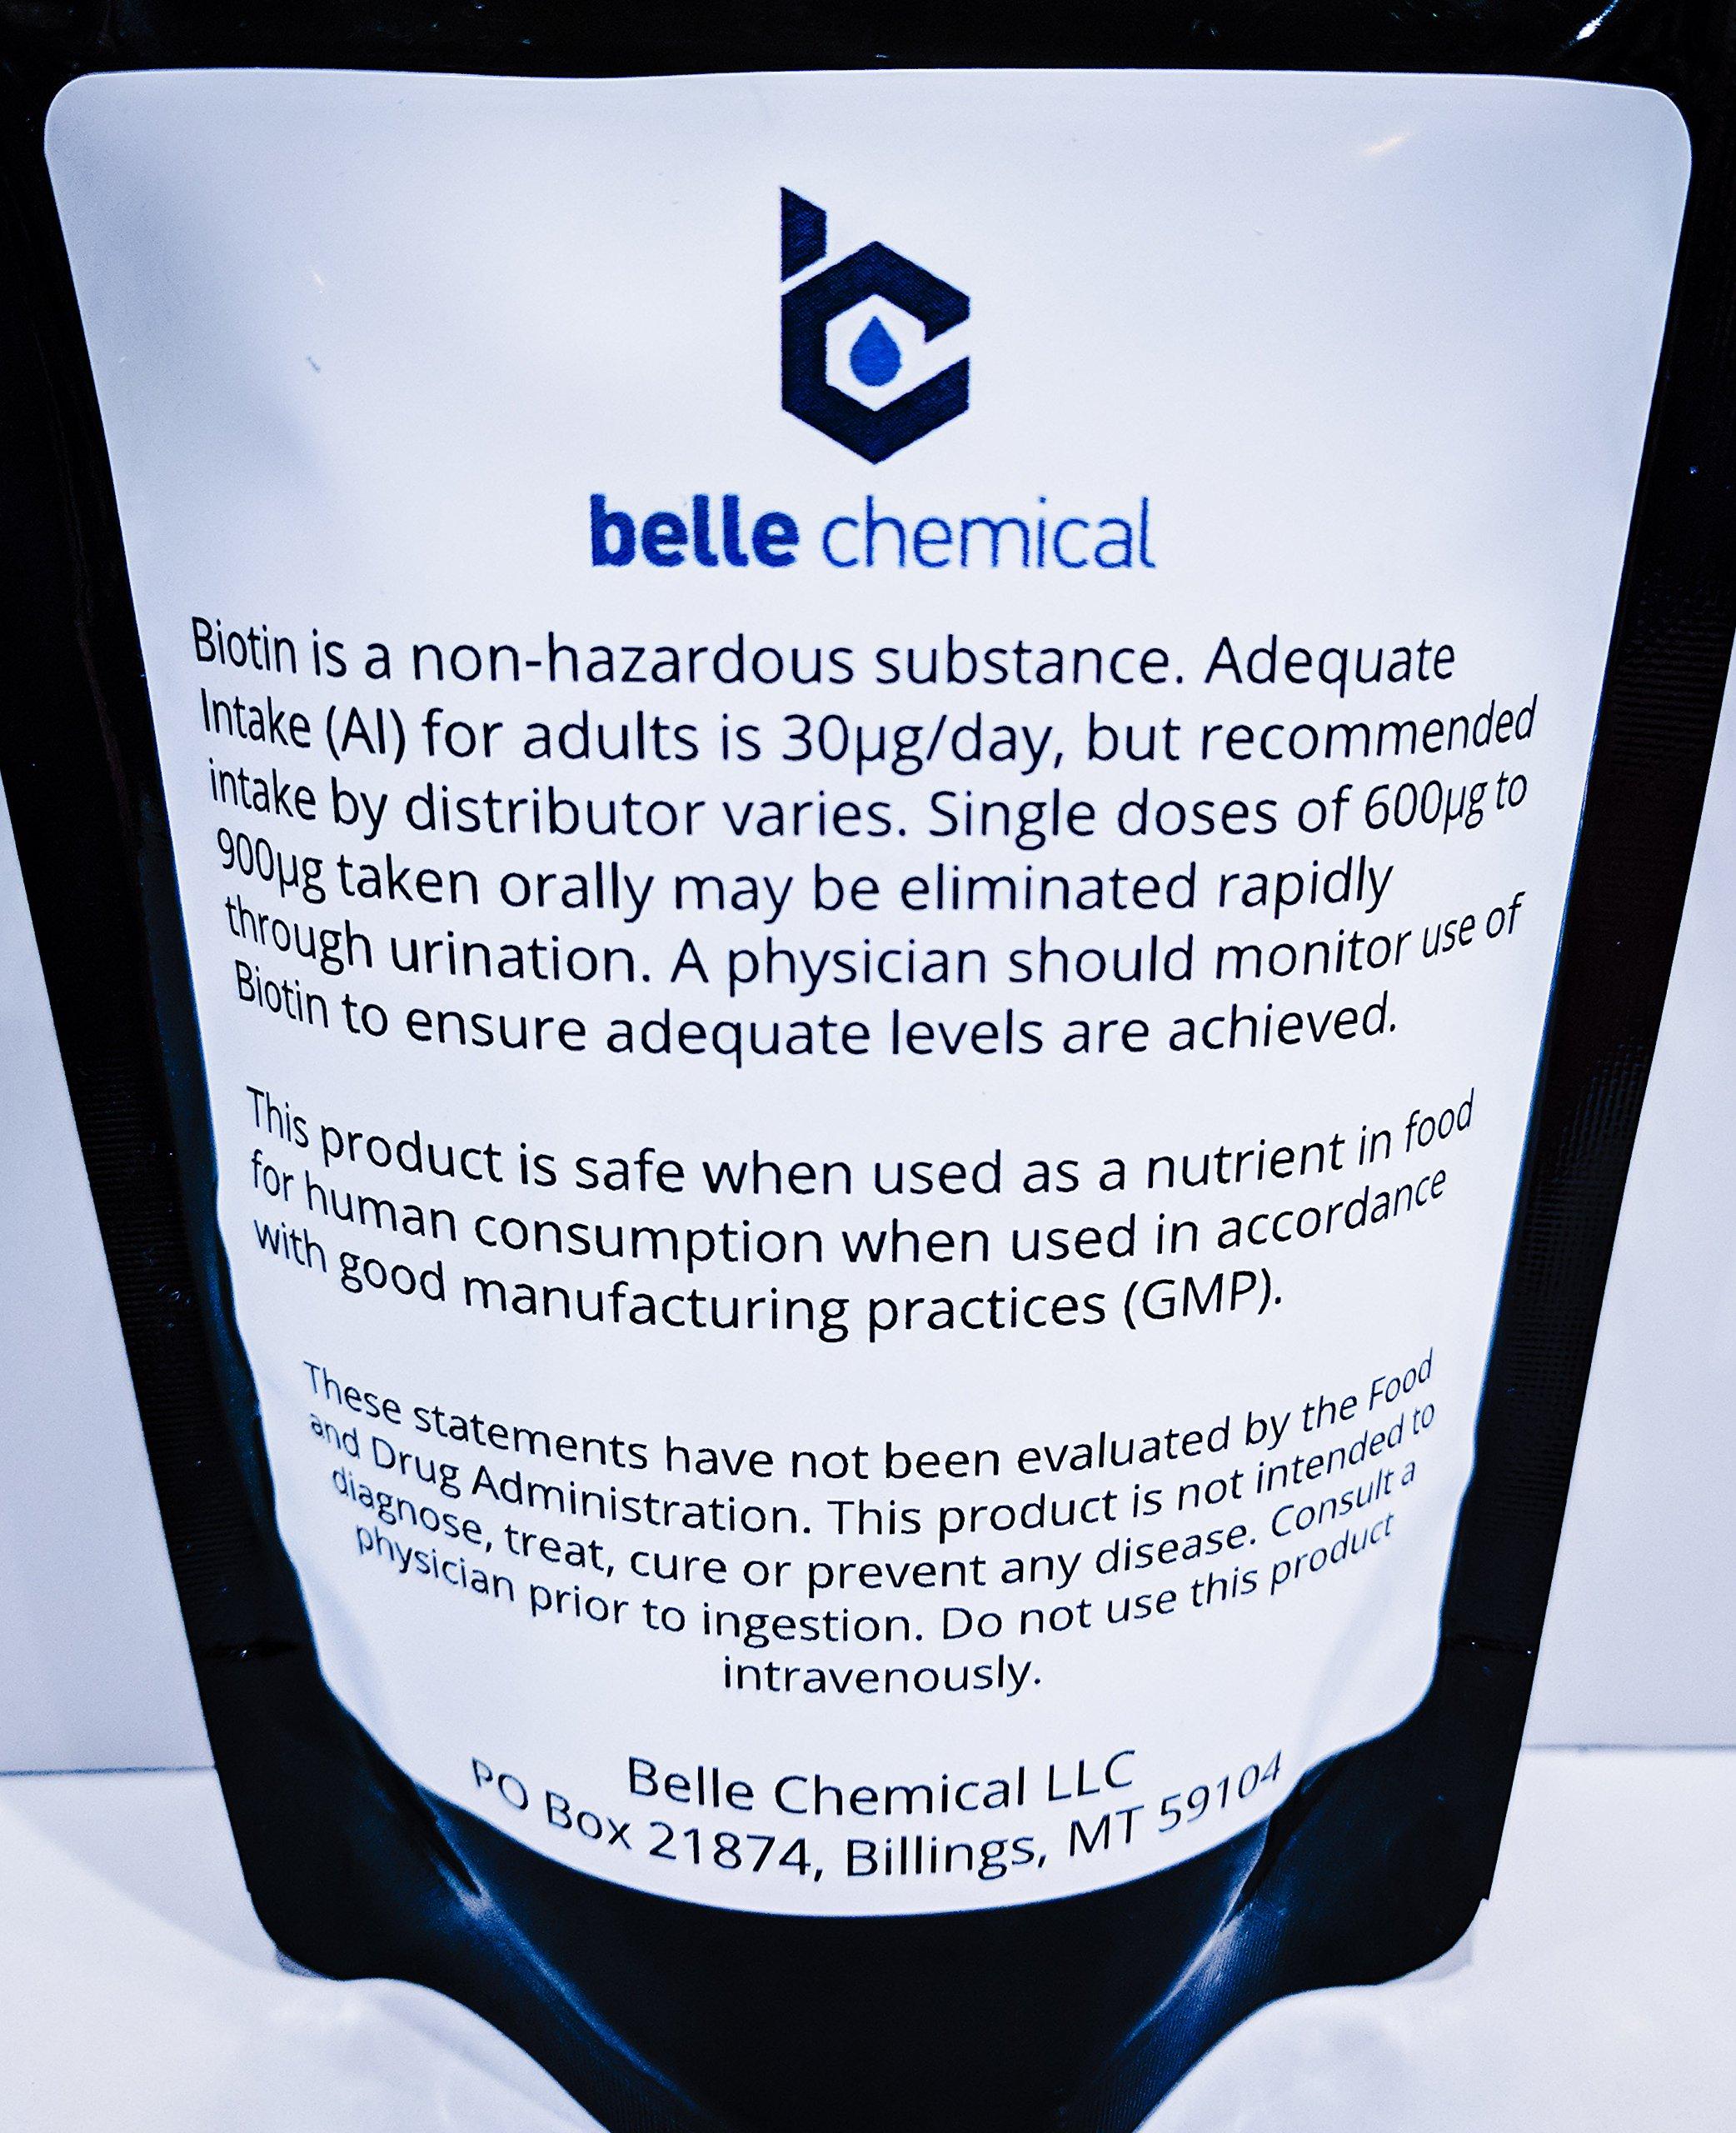 Biotin (Vitamin B7) Pure Powder 4oz (113g) Hair, Nails, Metabolism, Cell Growth